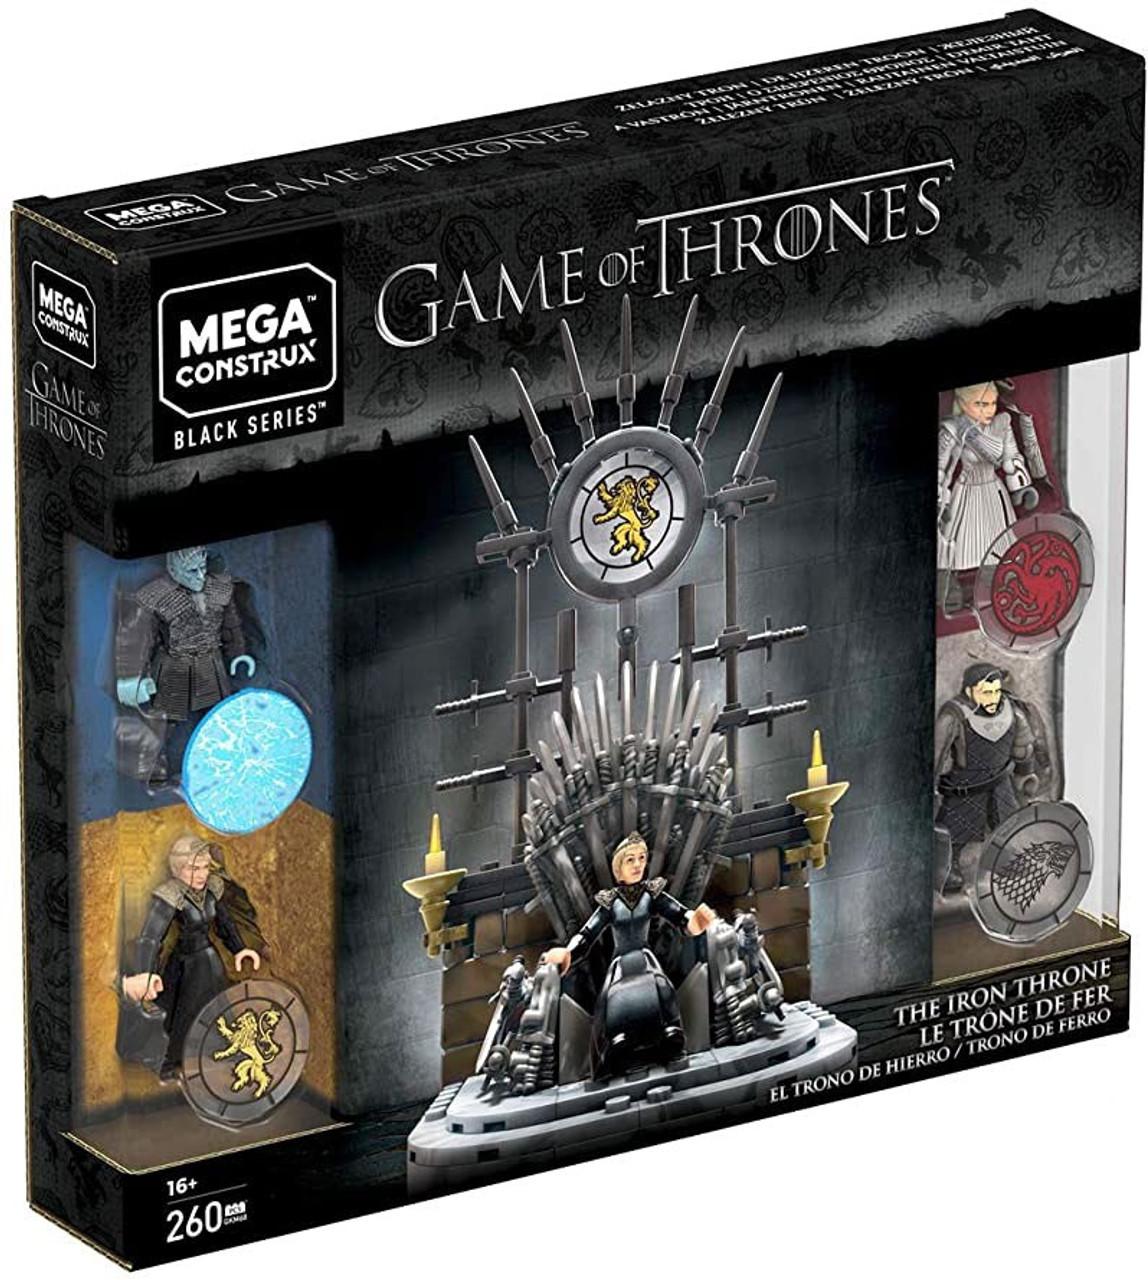 Game Of Thrones Mega Construx Black Series Iron Throne Set Mattel